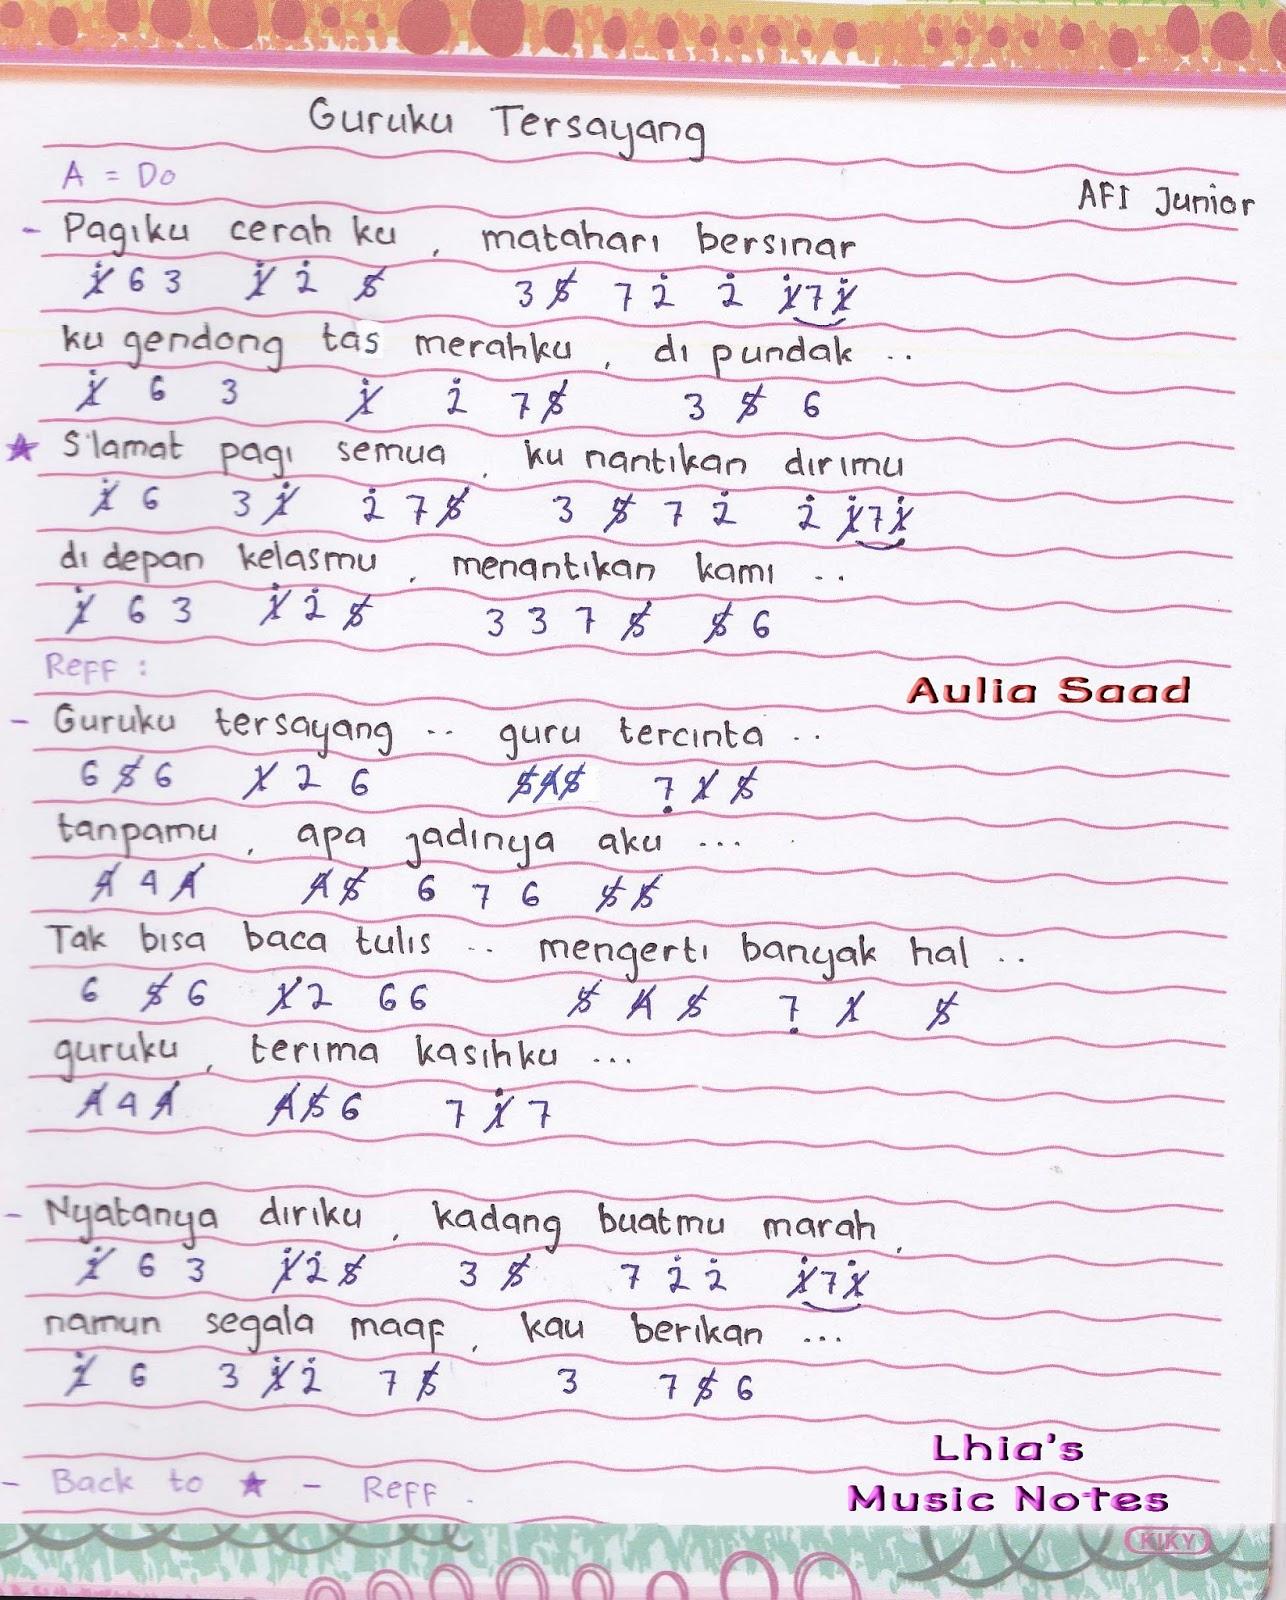 Lirik Chord Lagu Jikustik Puisi: Not Piano Pianika Lagu Guruku Tersayang